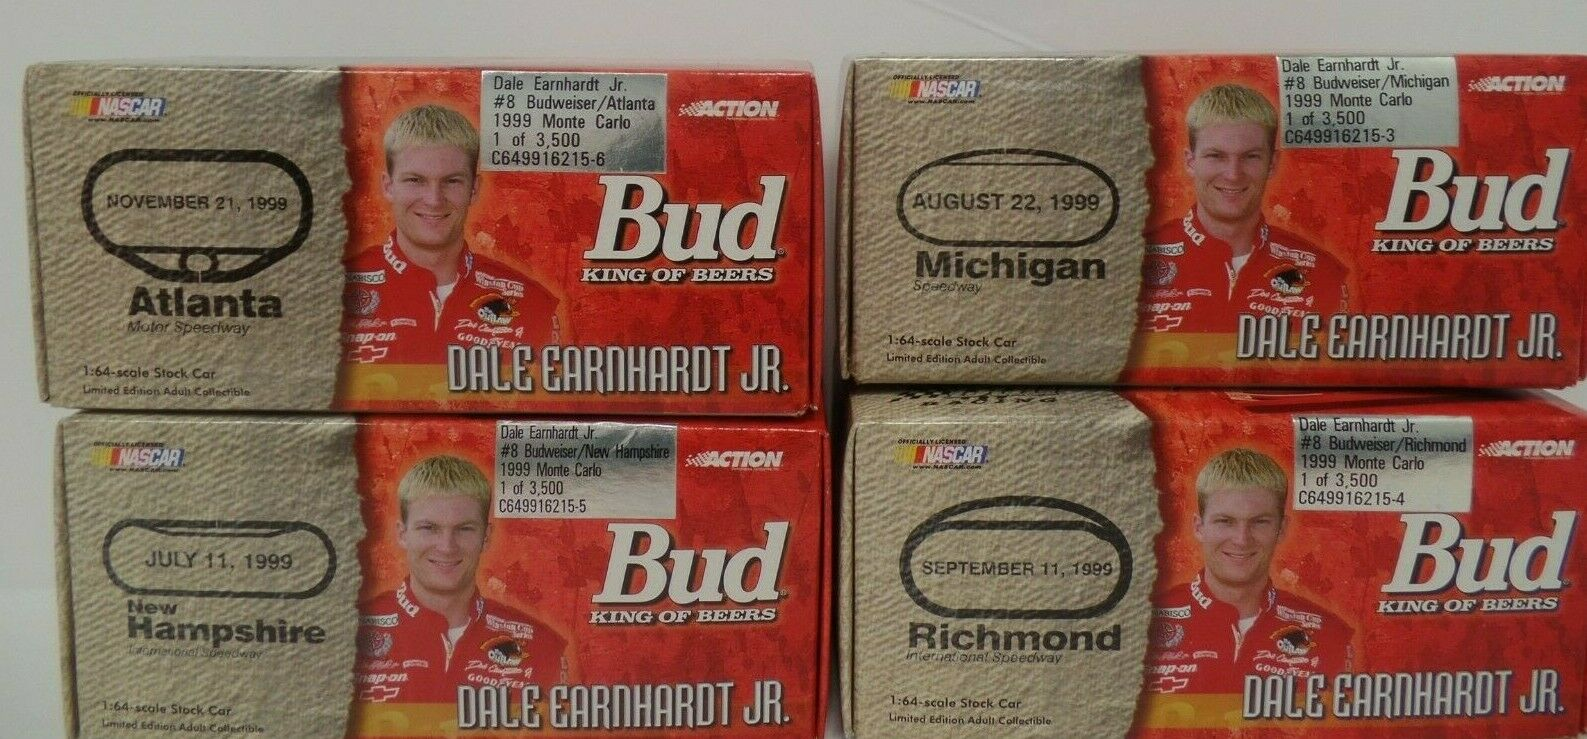 Dale Earnhardt Jr Lot of 4 Raceway Themed 1 64 Diecast Action  032619DBT3